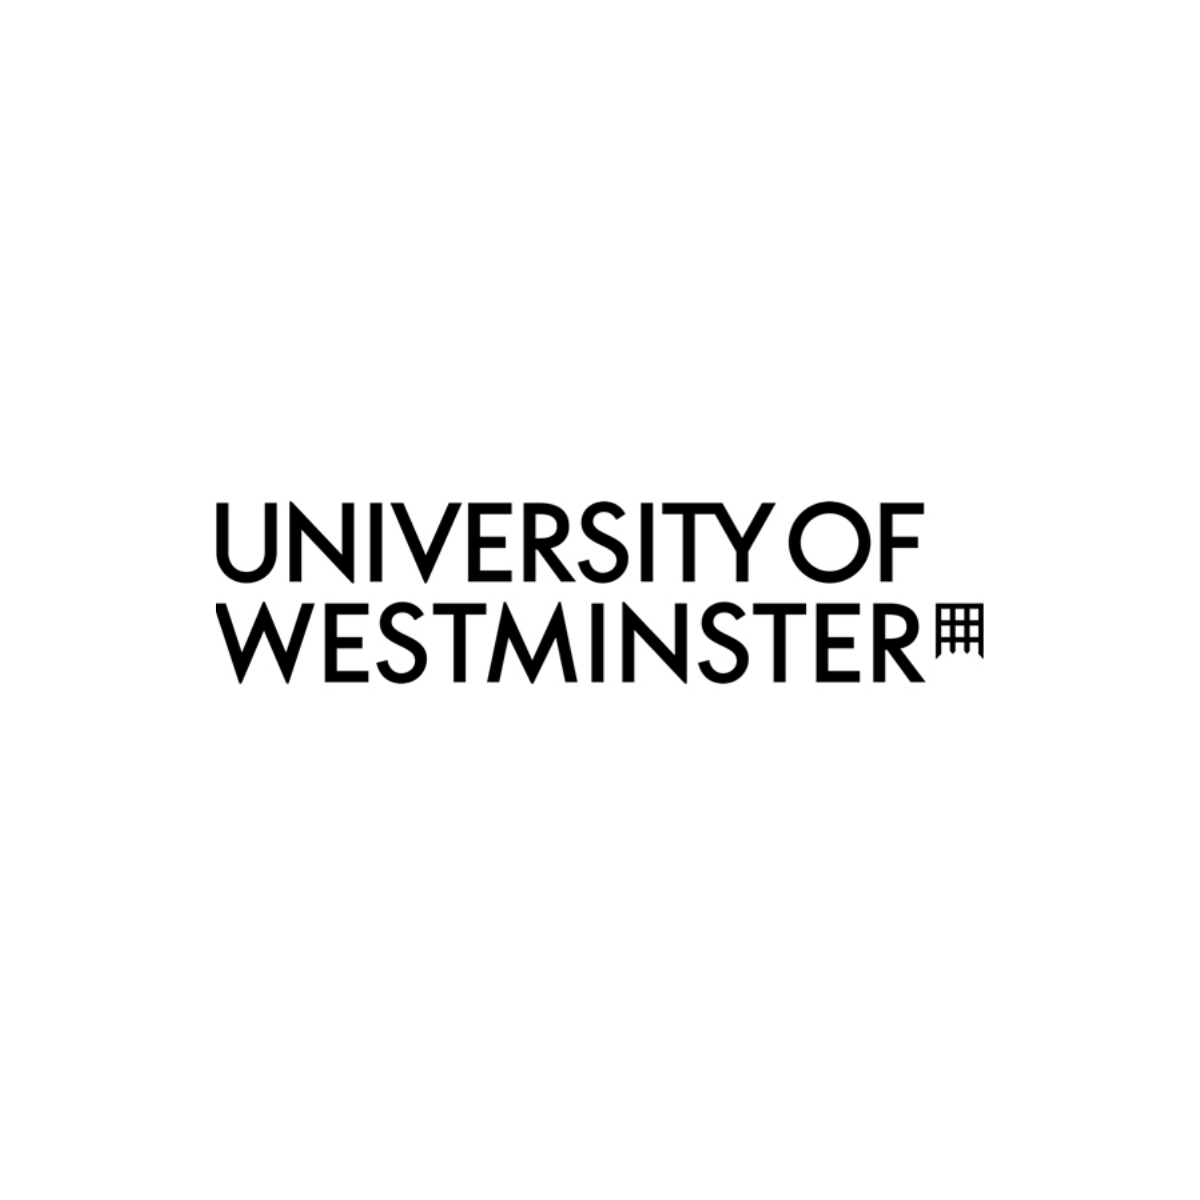 University of Westminster Logo Image